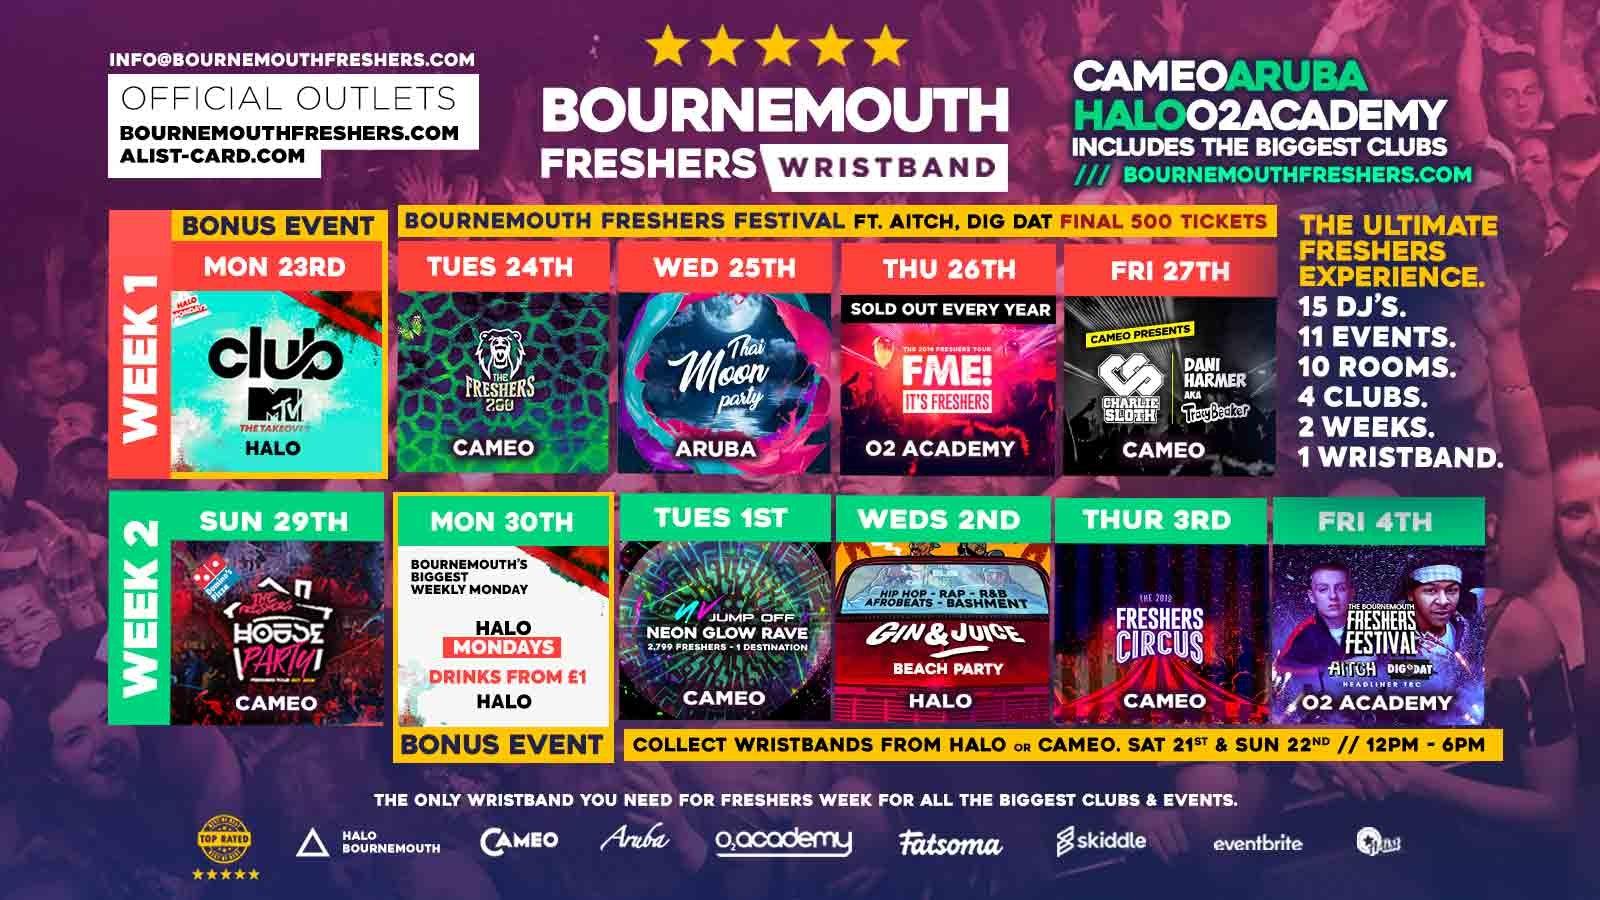 Bournemouth Freshers Wristband 2019 // Bournemouth Freshers 2019 // Cameo – Halo – O2 Academy – Aruba